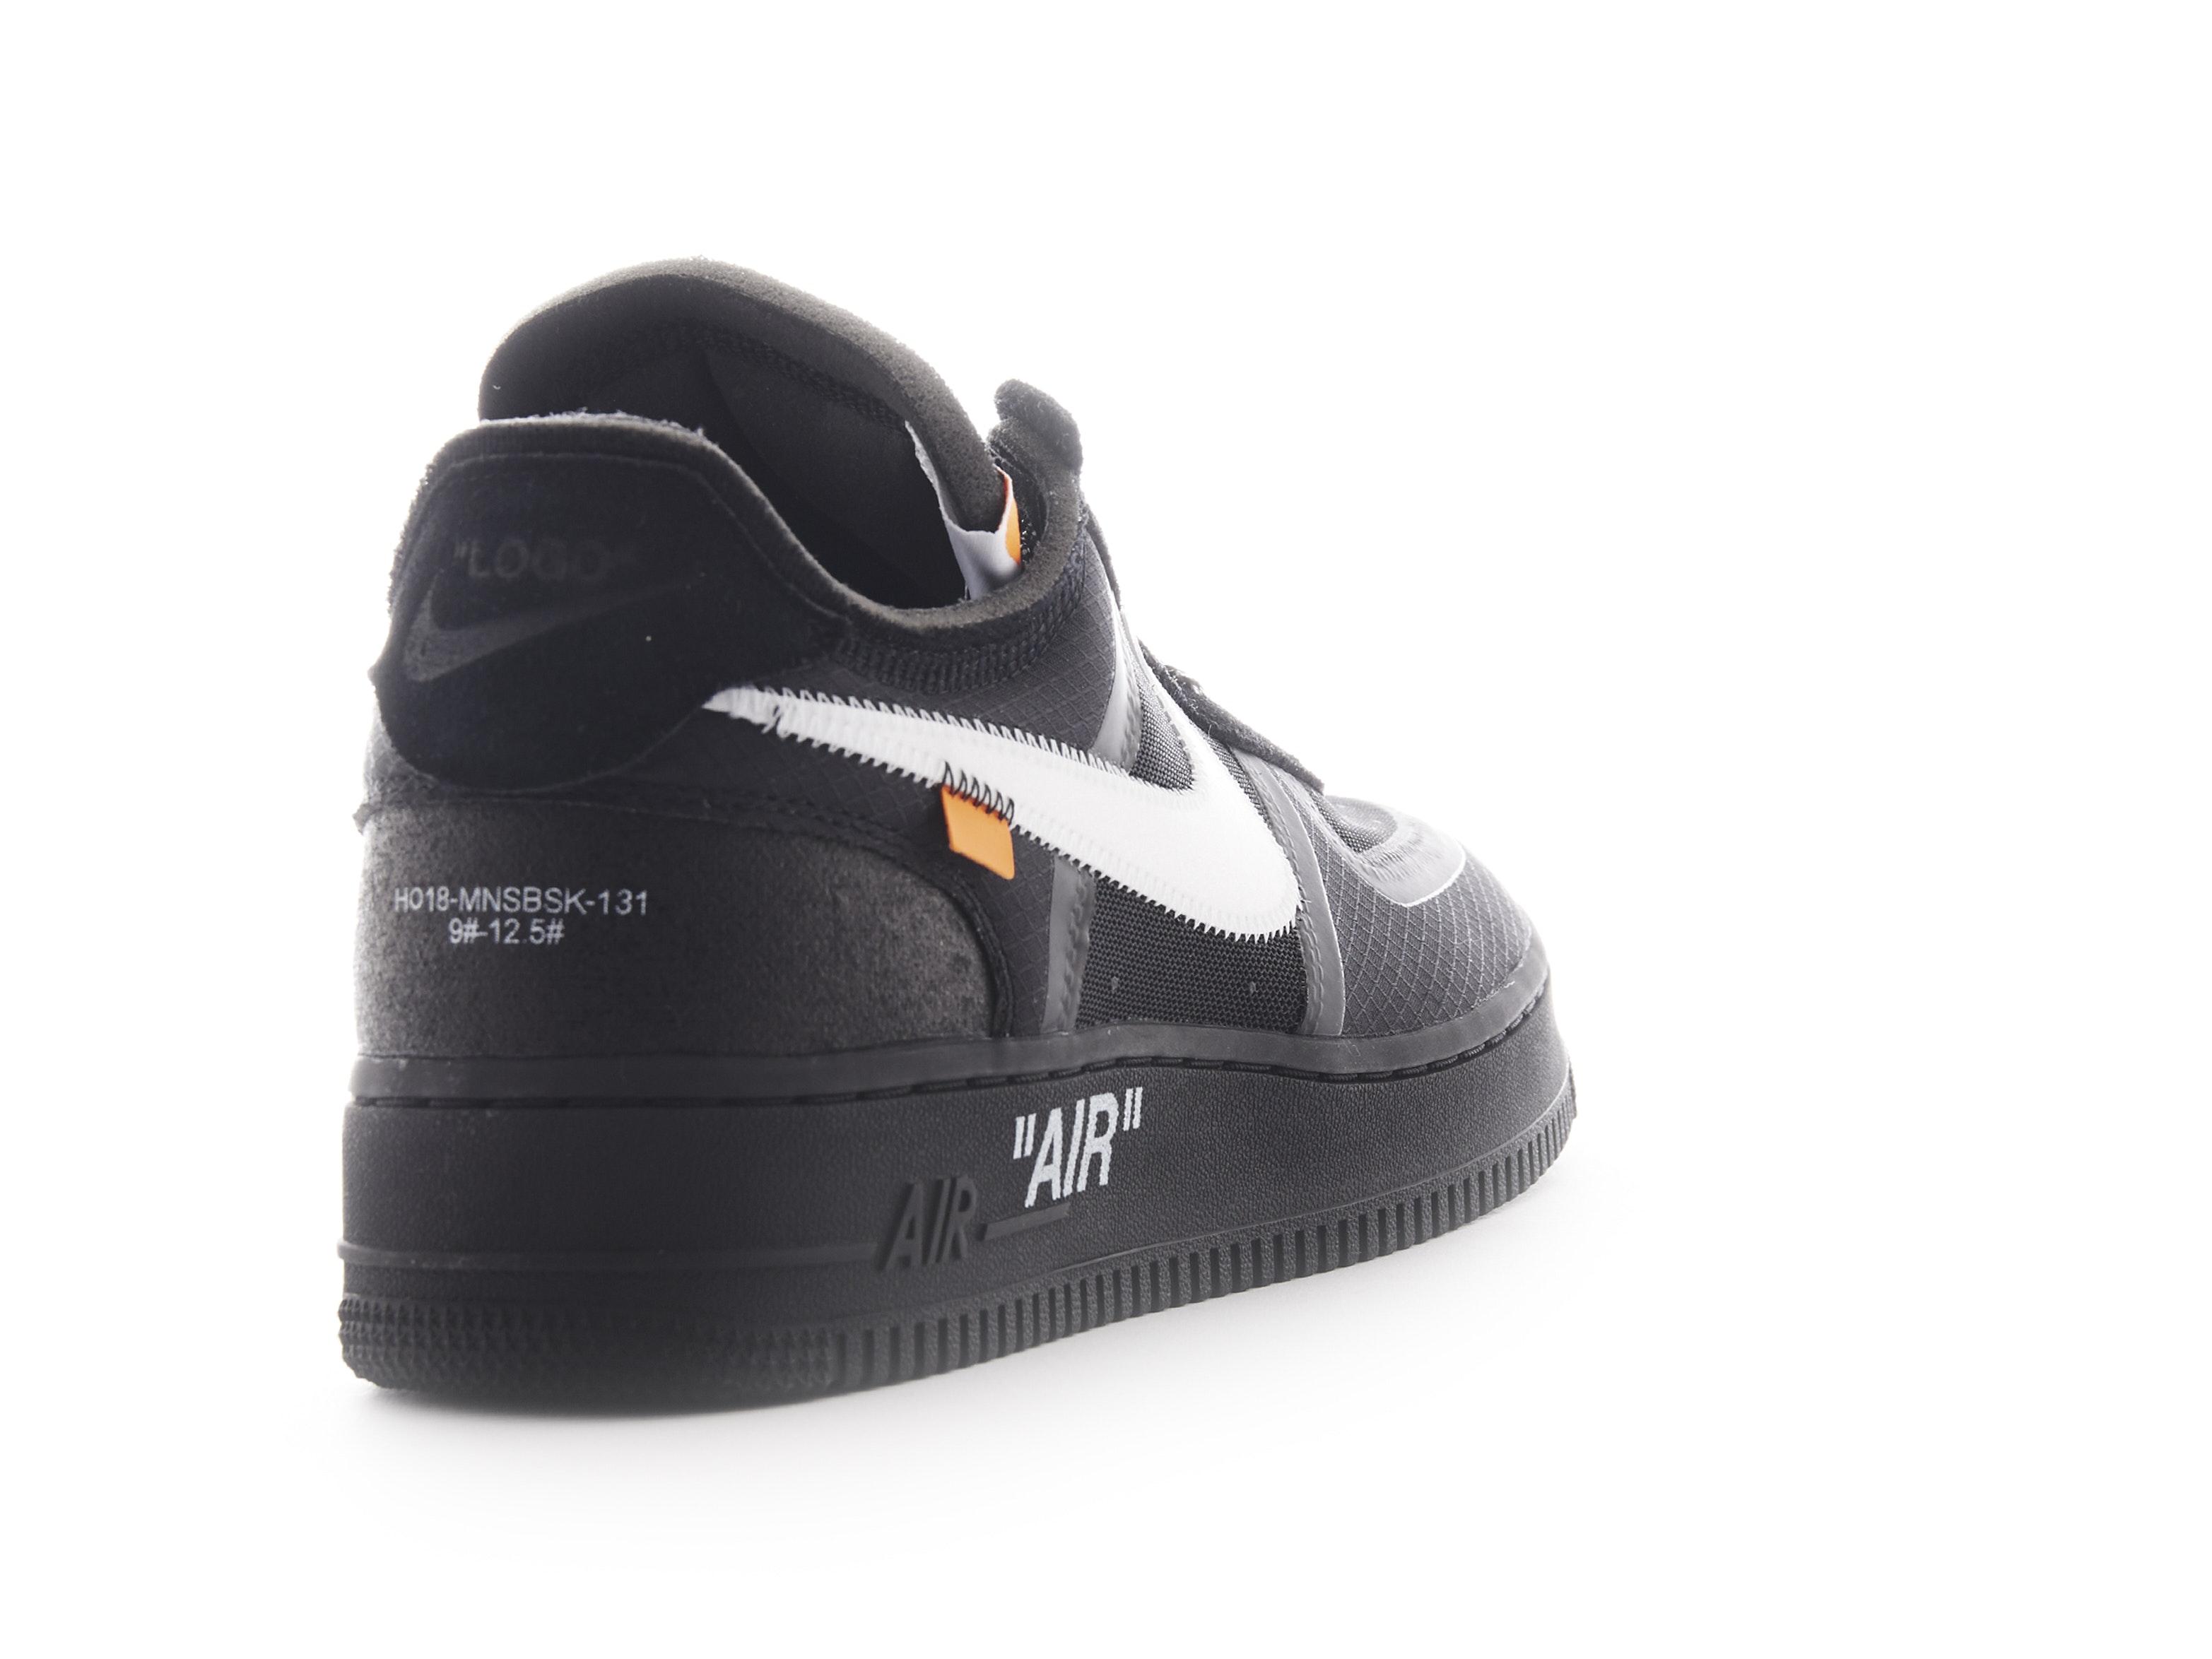 buy online 5d765 7b223 Shop Air Force 1 Low Black x Off-White Online | Laced